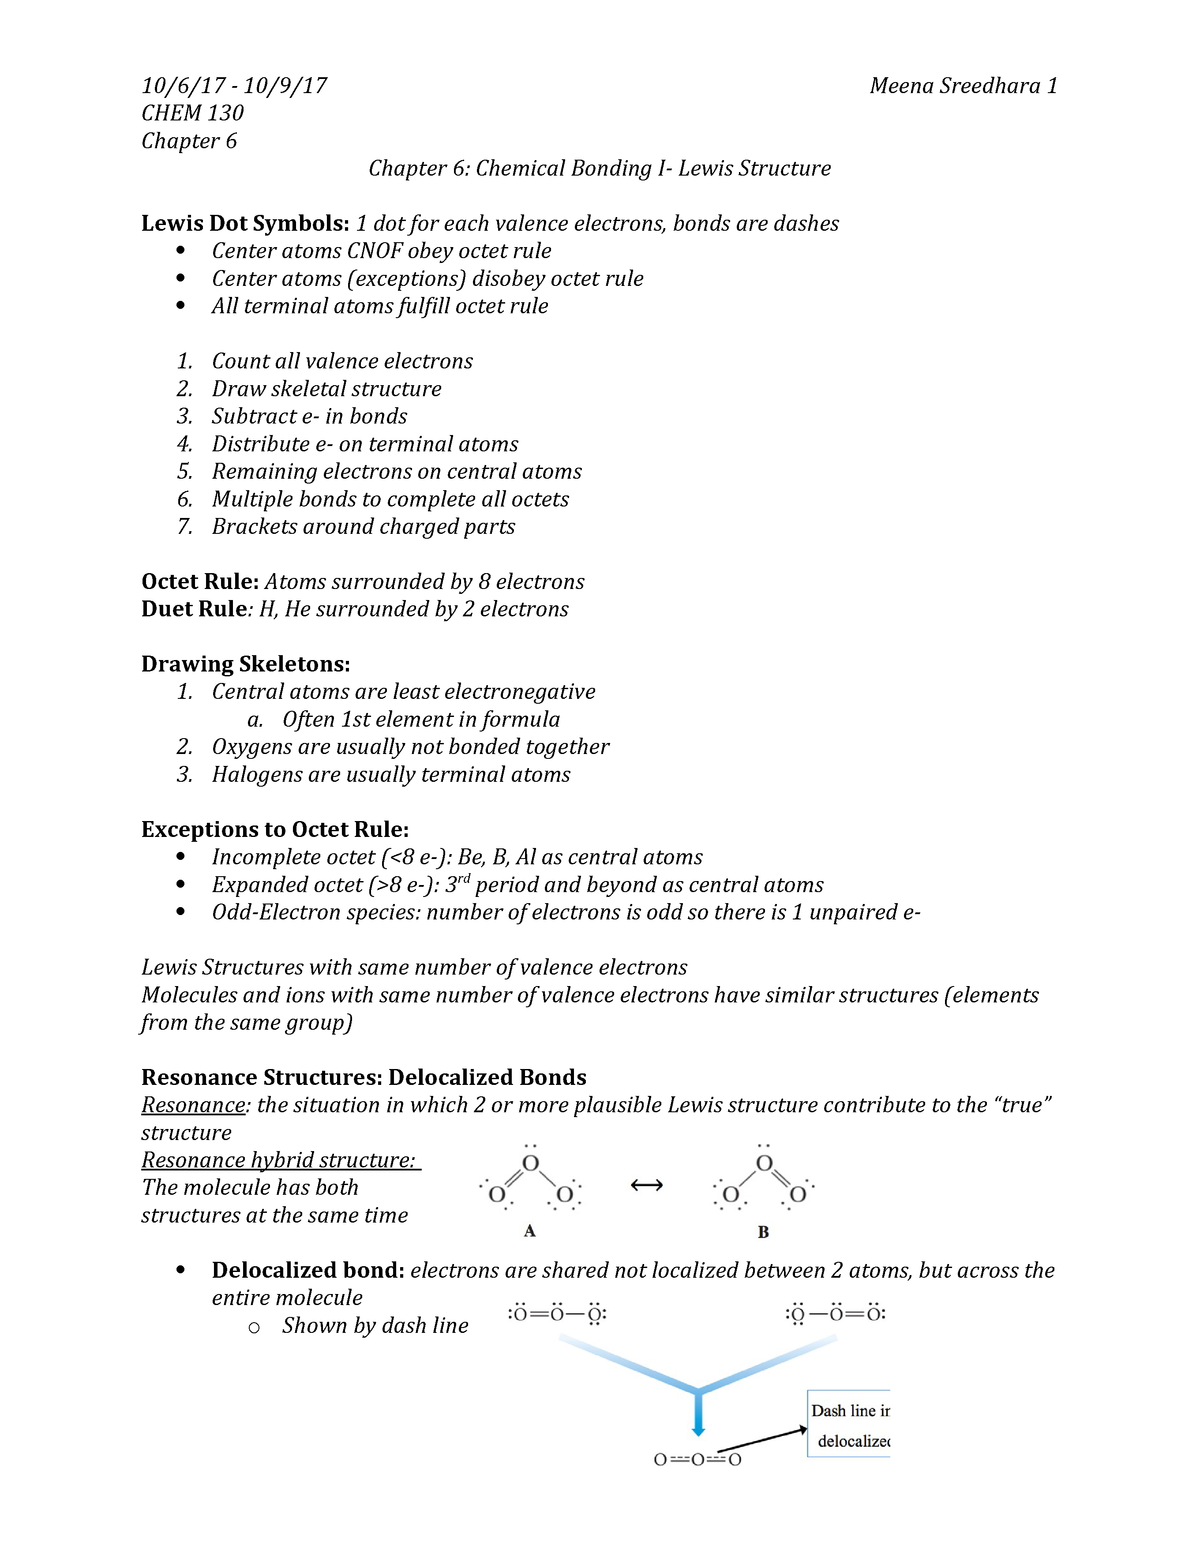 CHEM 130 Chapter 6 Notes - Chem 170: Foundations of